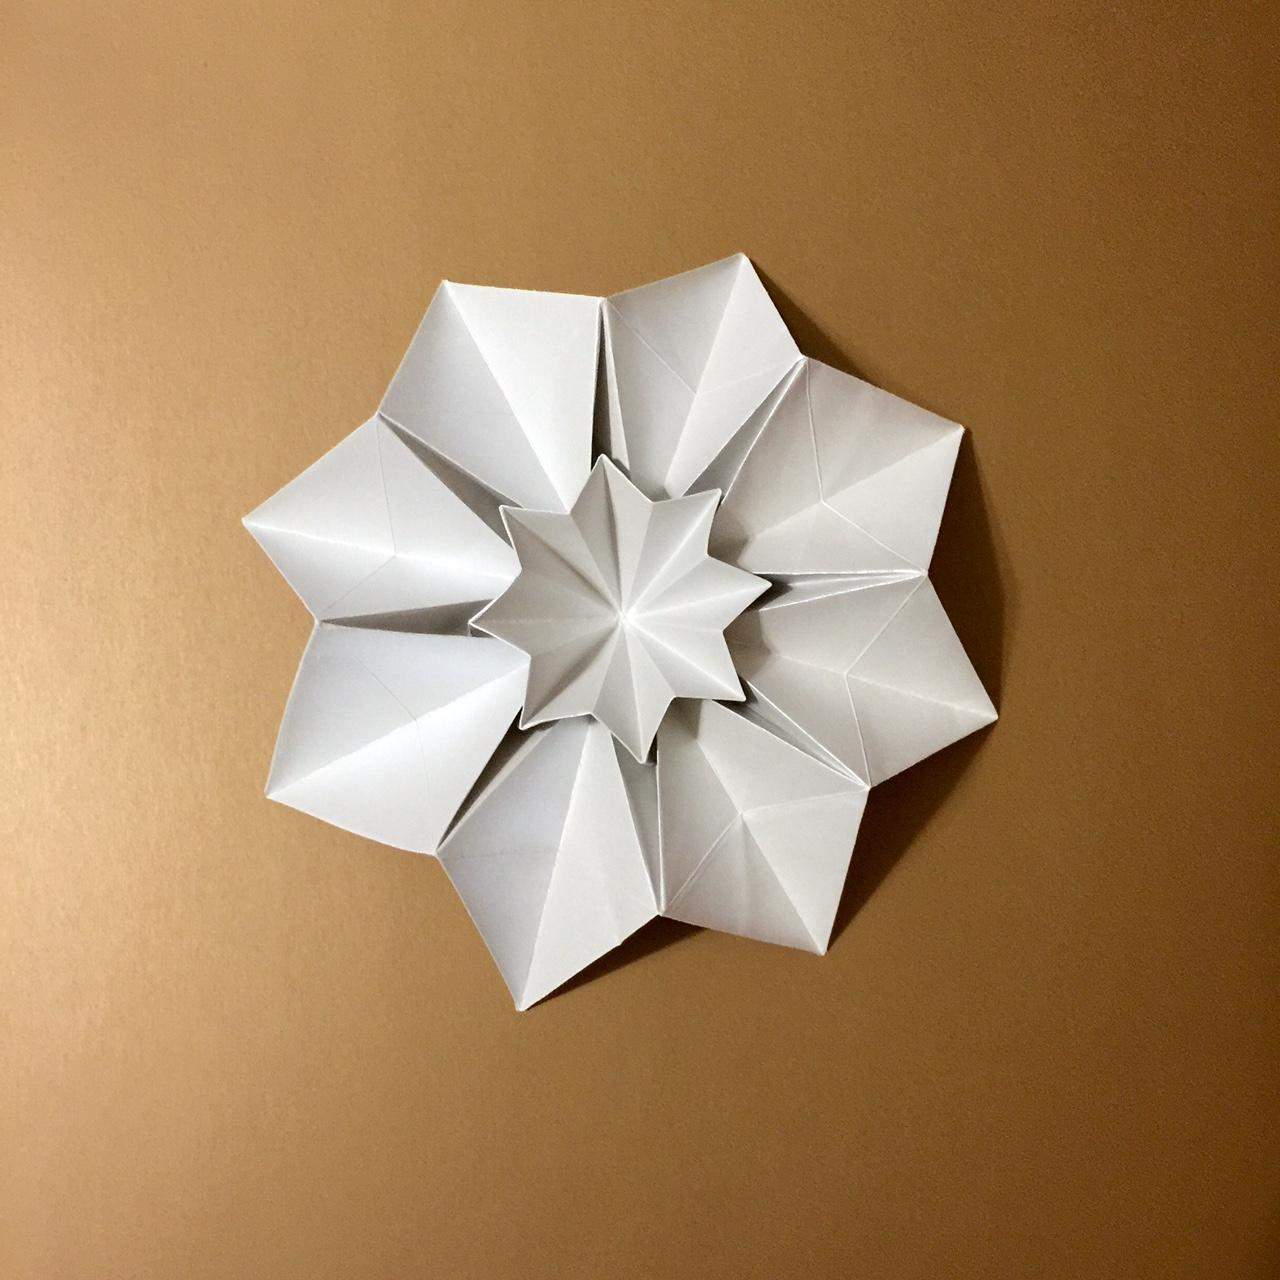 Origami Star Blessilda - photo#47